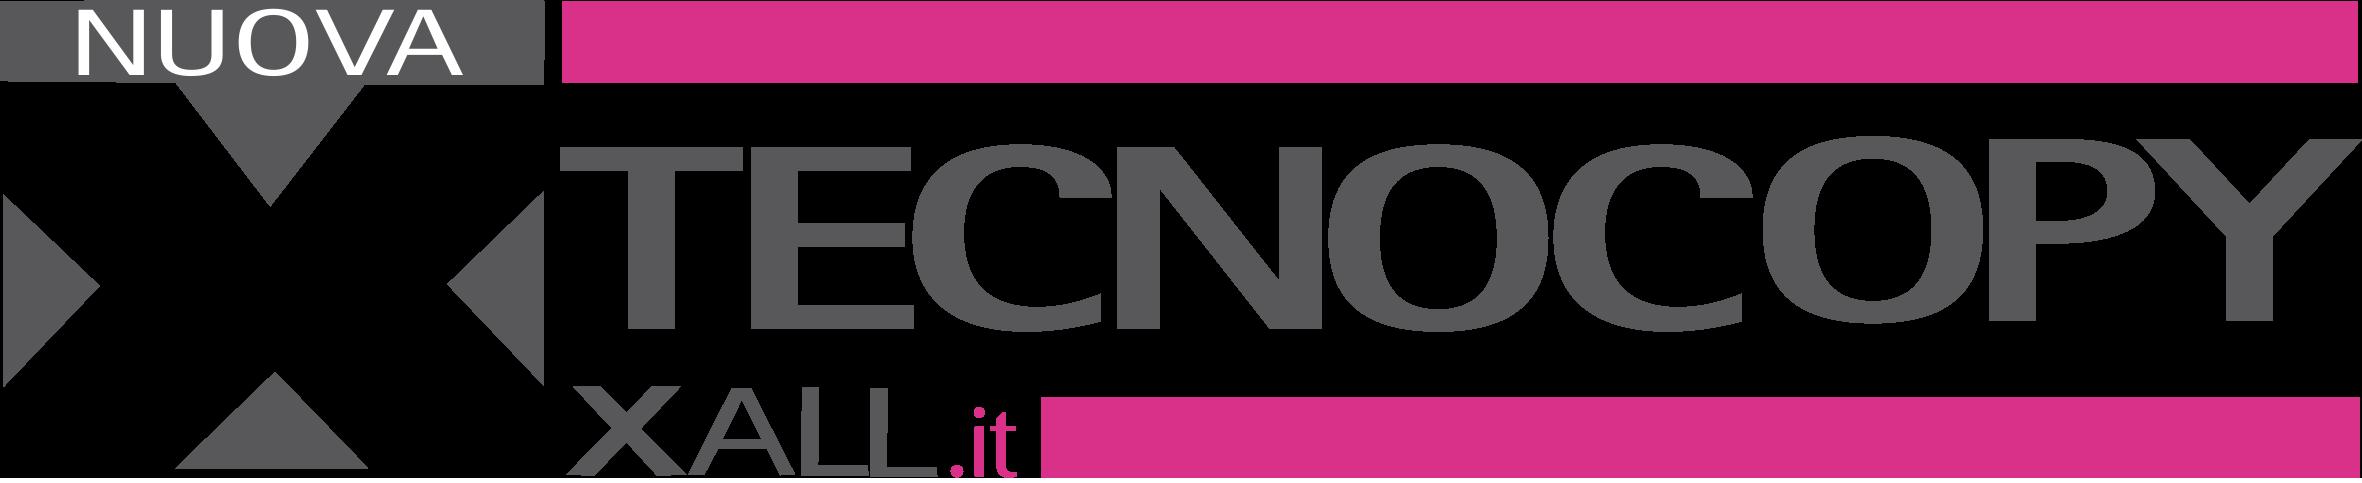 Tecnocopy nuovo logo